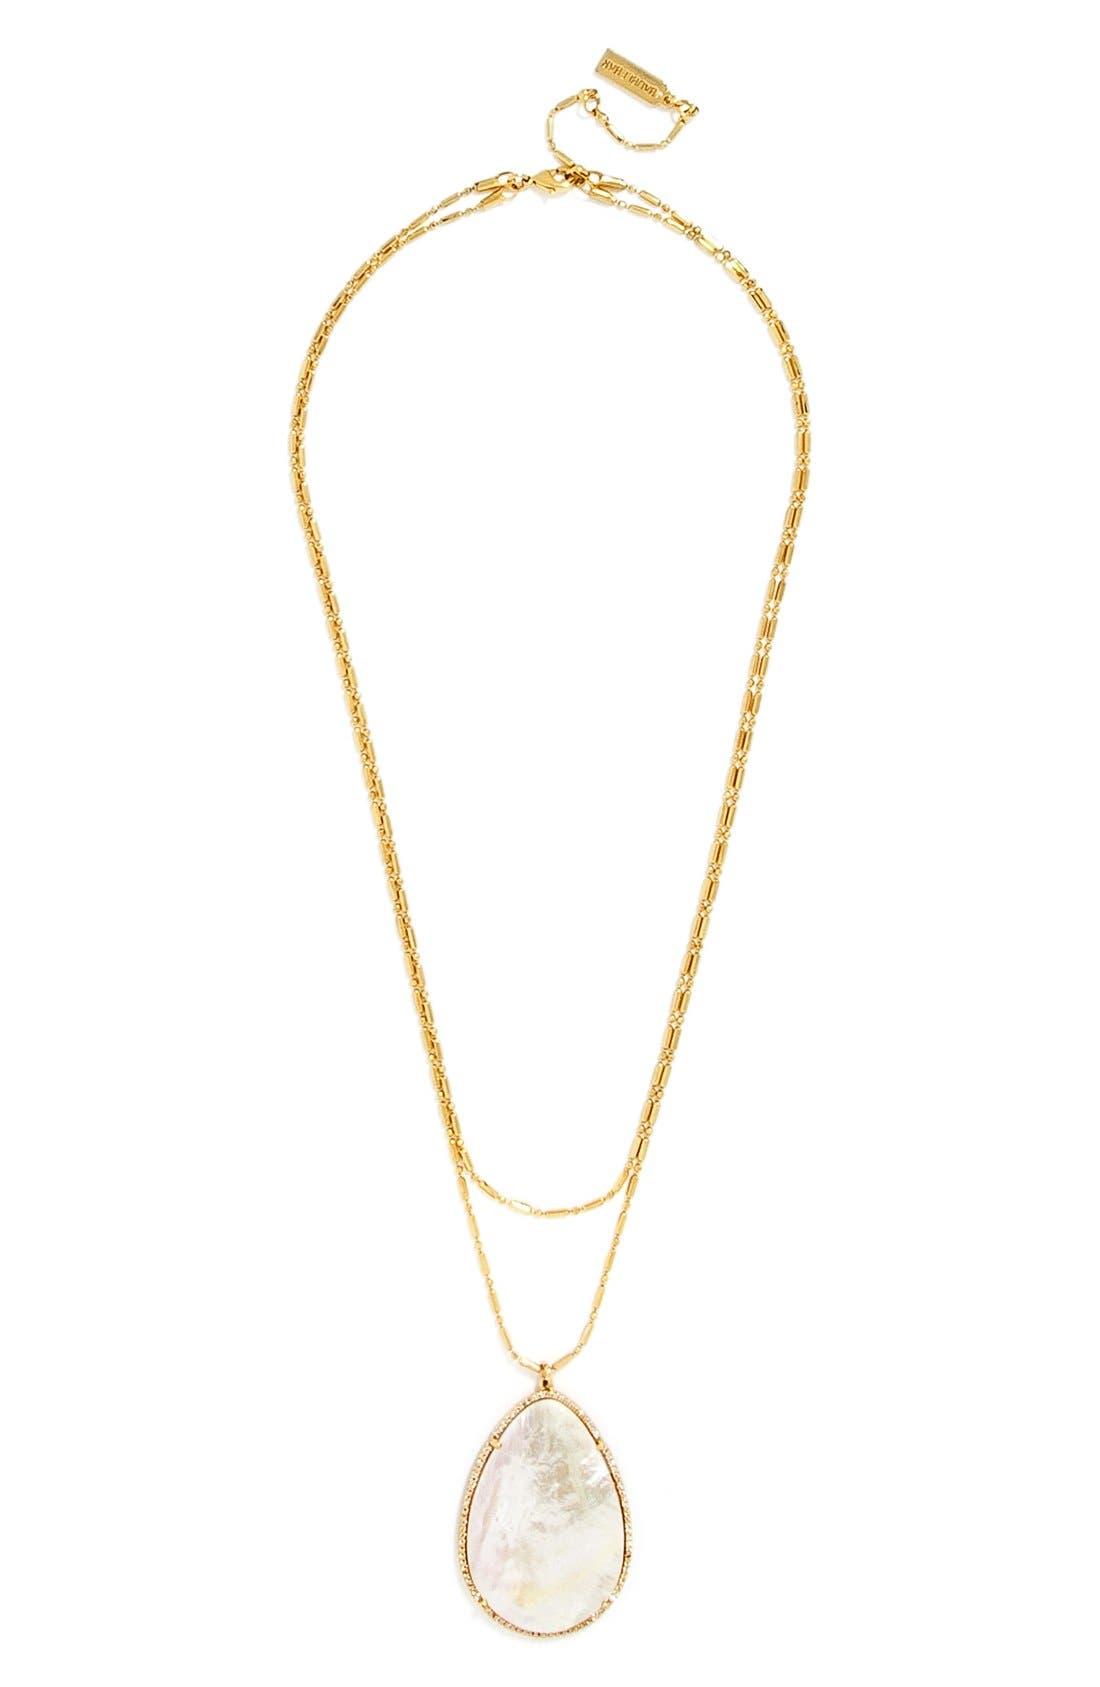 Alternate Image 1 Selected - BaubleBar 'Seashell' Pendant Necklace